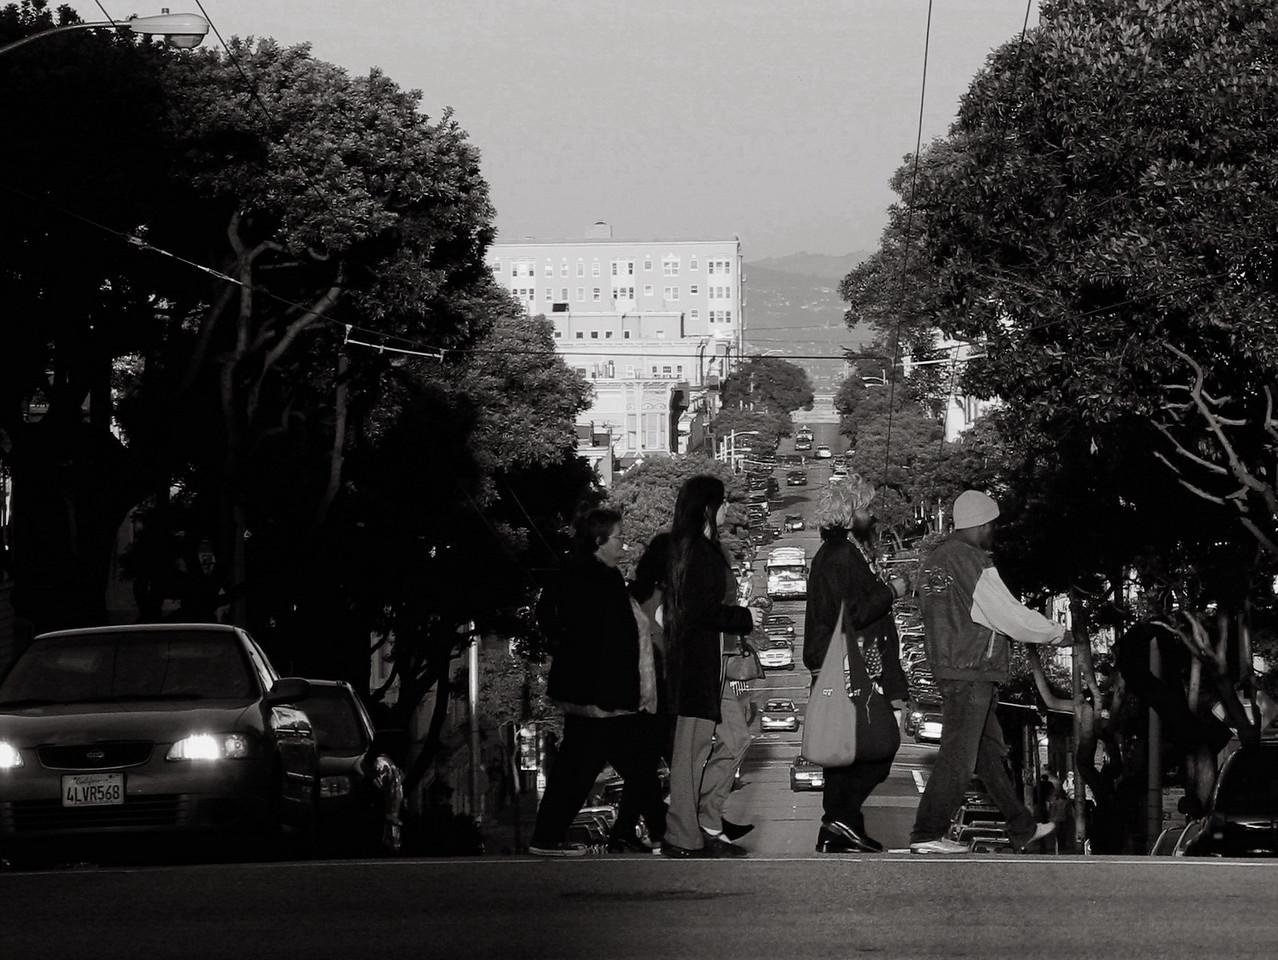 Abbey Road deja vu - San Francisco March 2006